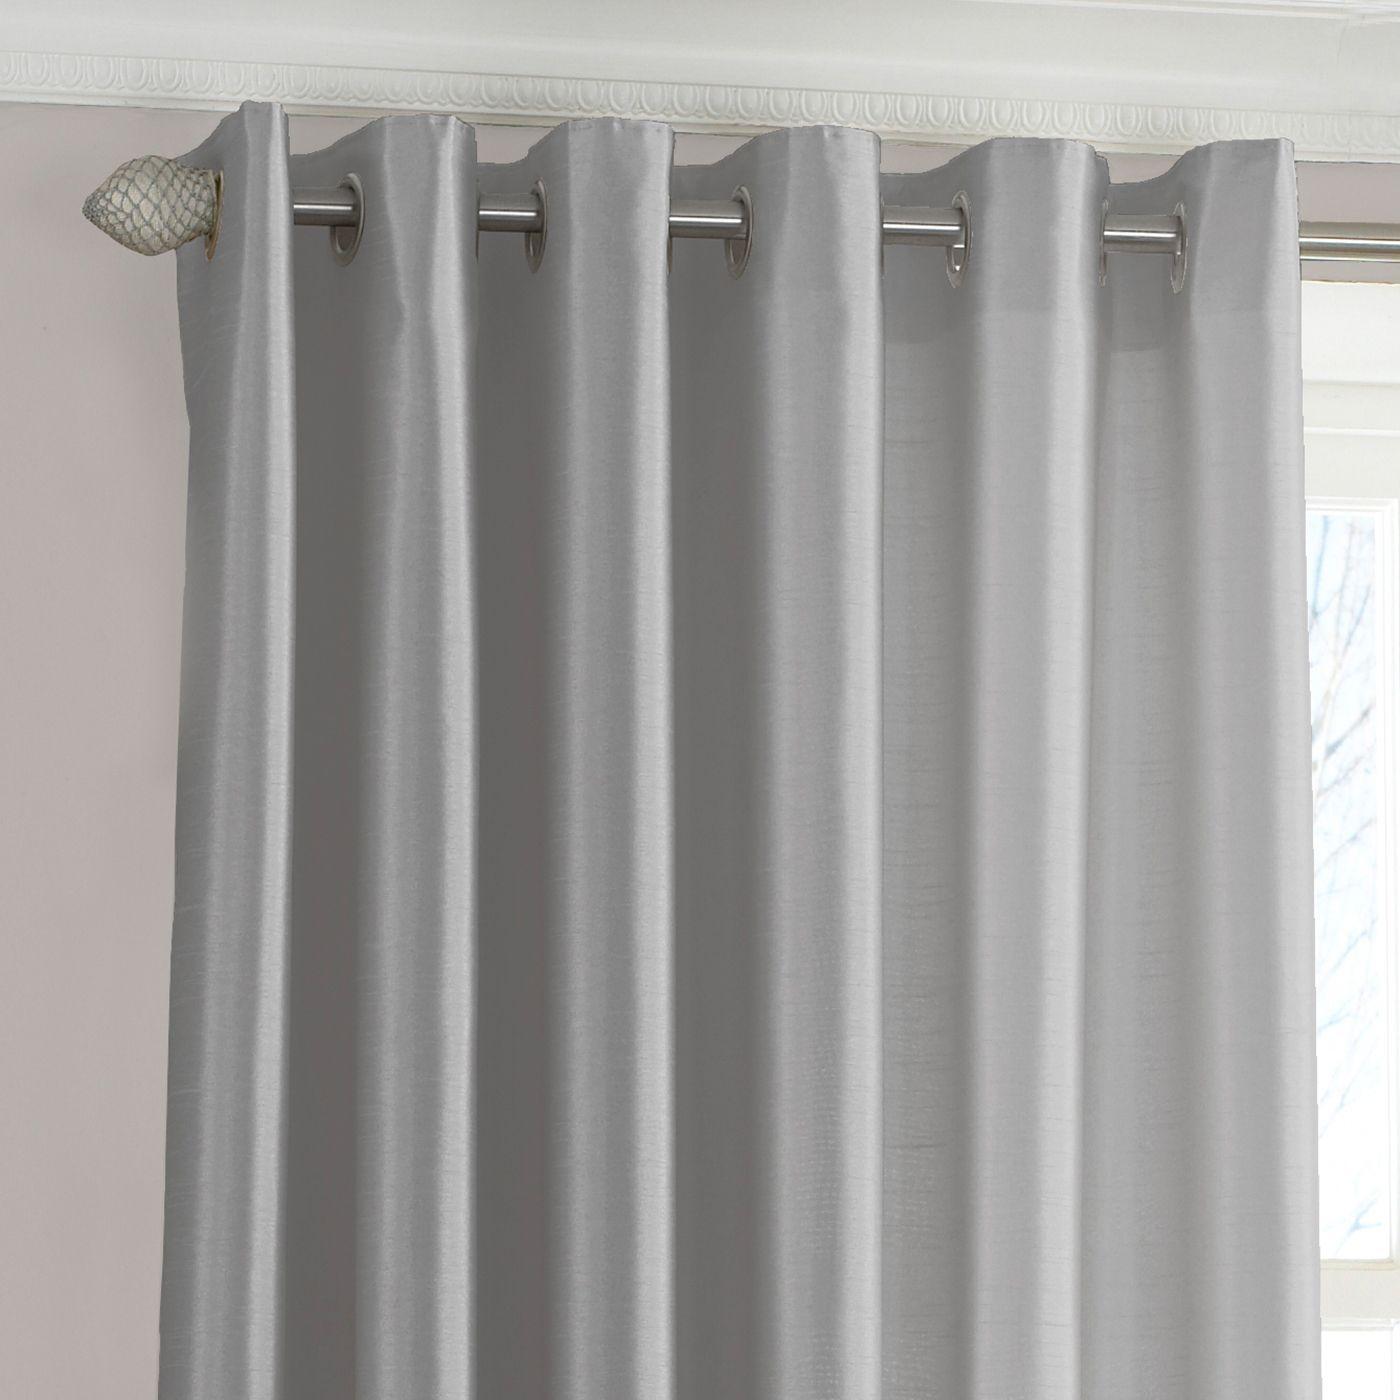 Fiji Silk Effect Eyelet Curtains in Steel